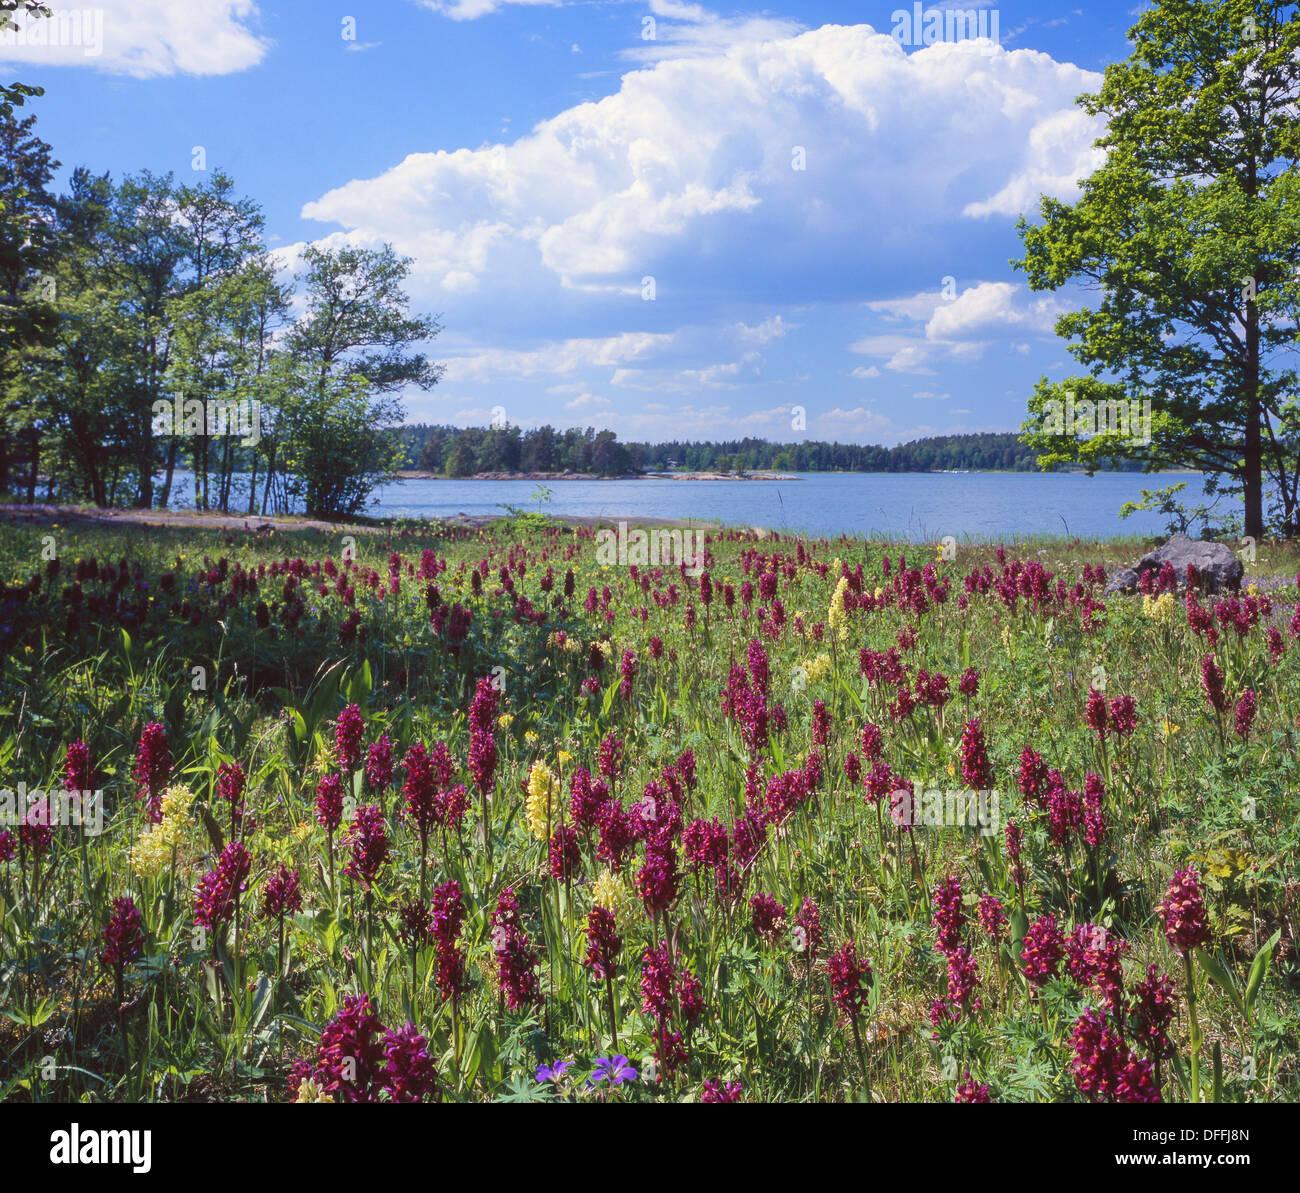 Orchids At ängsö National Park Uppland Sweden Stock Photo 61194581